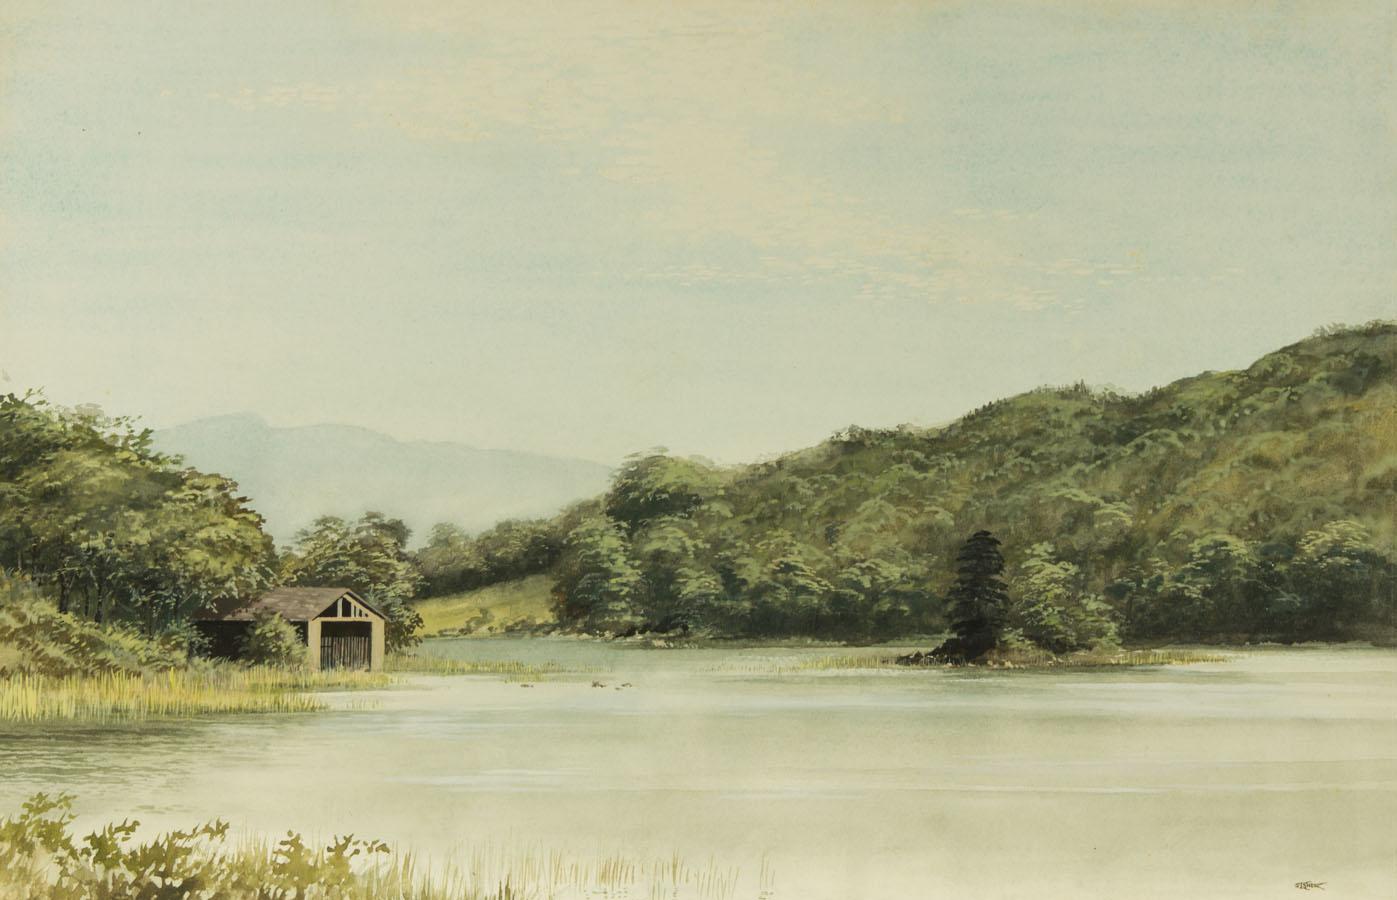 Walkden Fisher (1913-1979) FRSA  - 1972 Gouache, Rydal Water